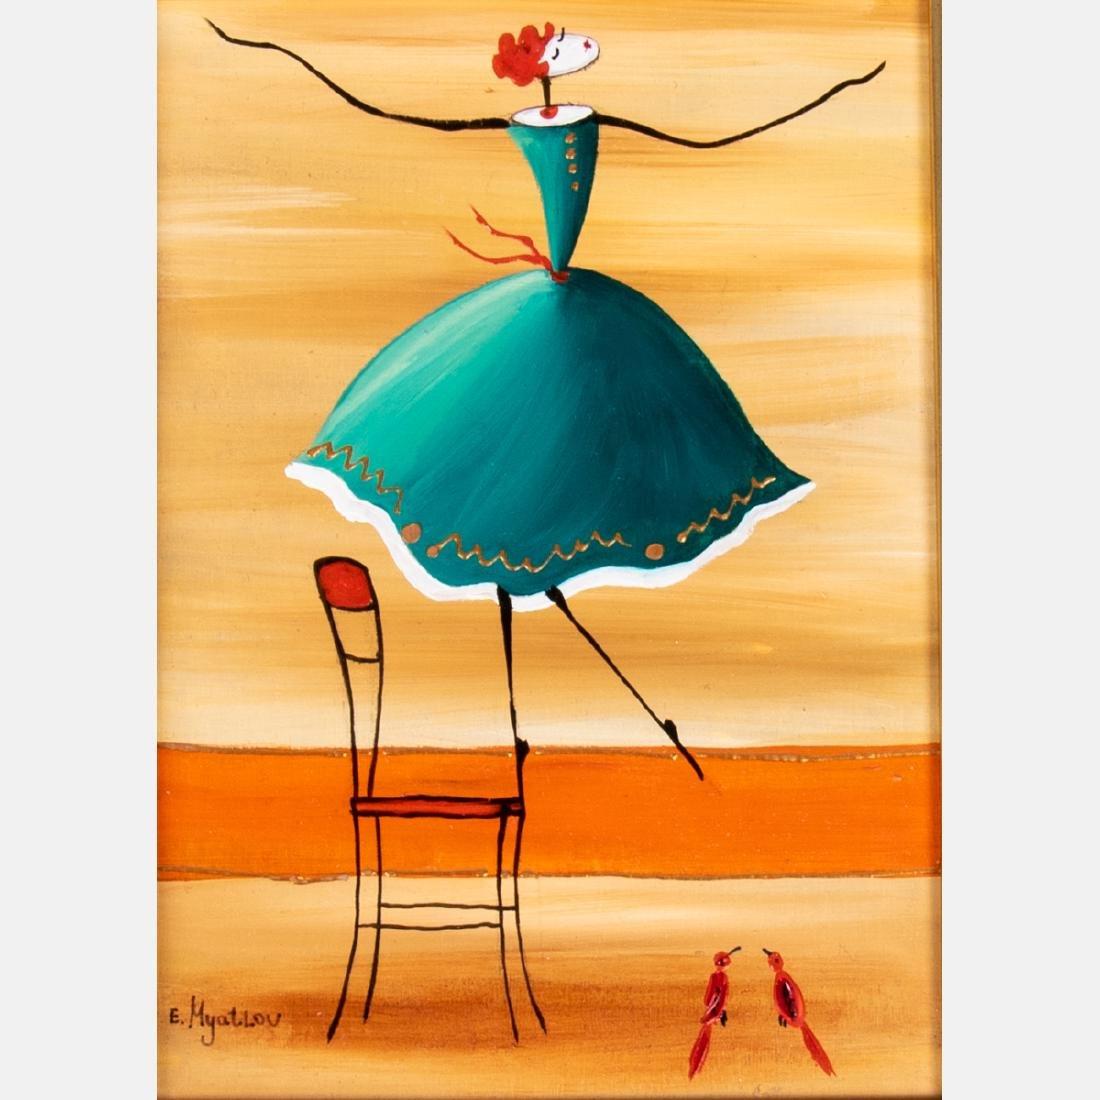 Ester Myatlov (b. 1976) 'Reaching for You', 'Wind - 7